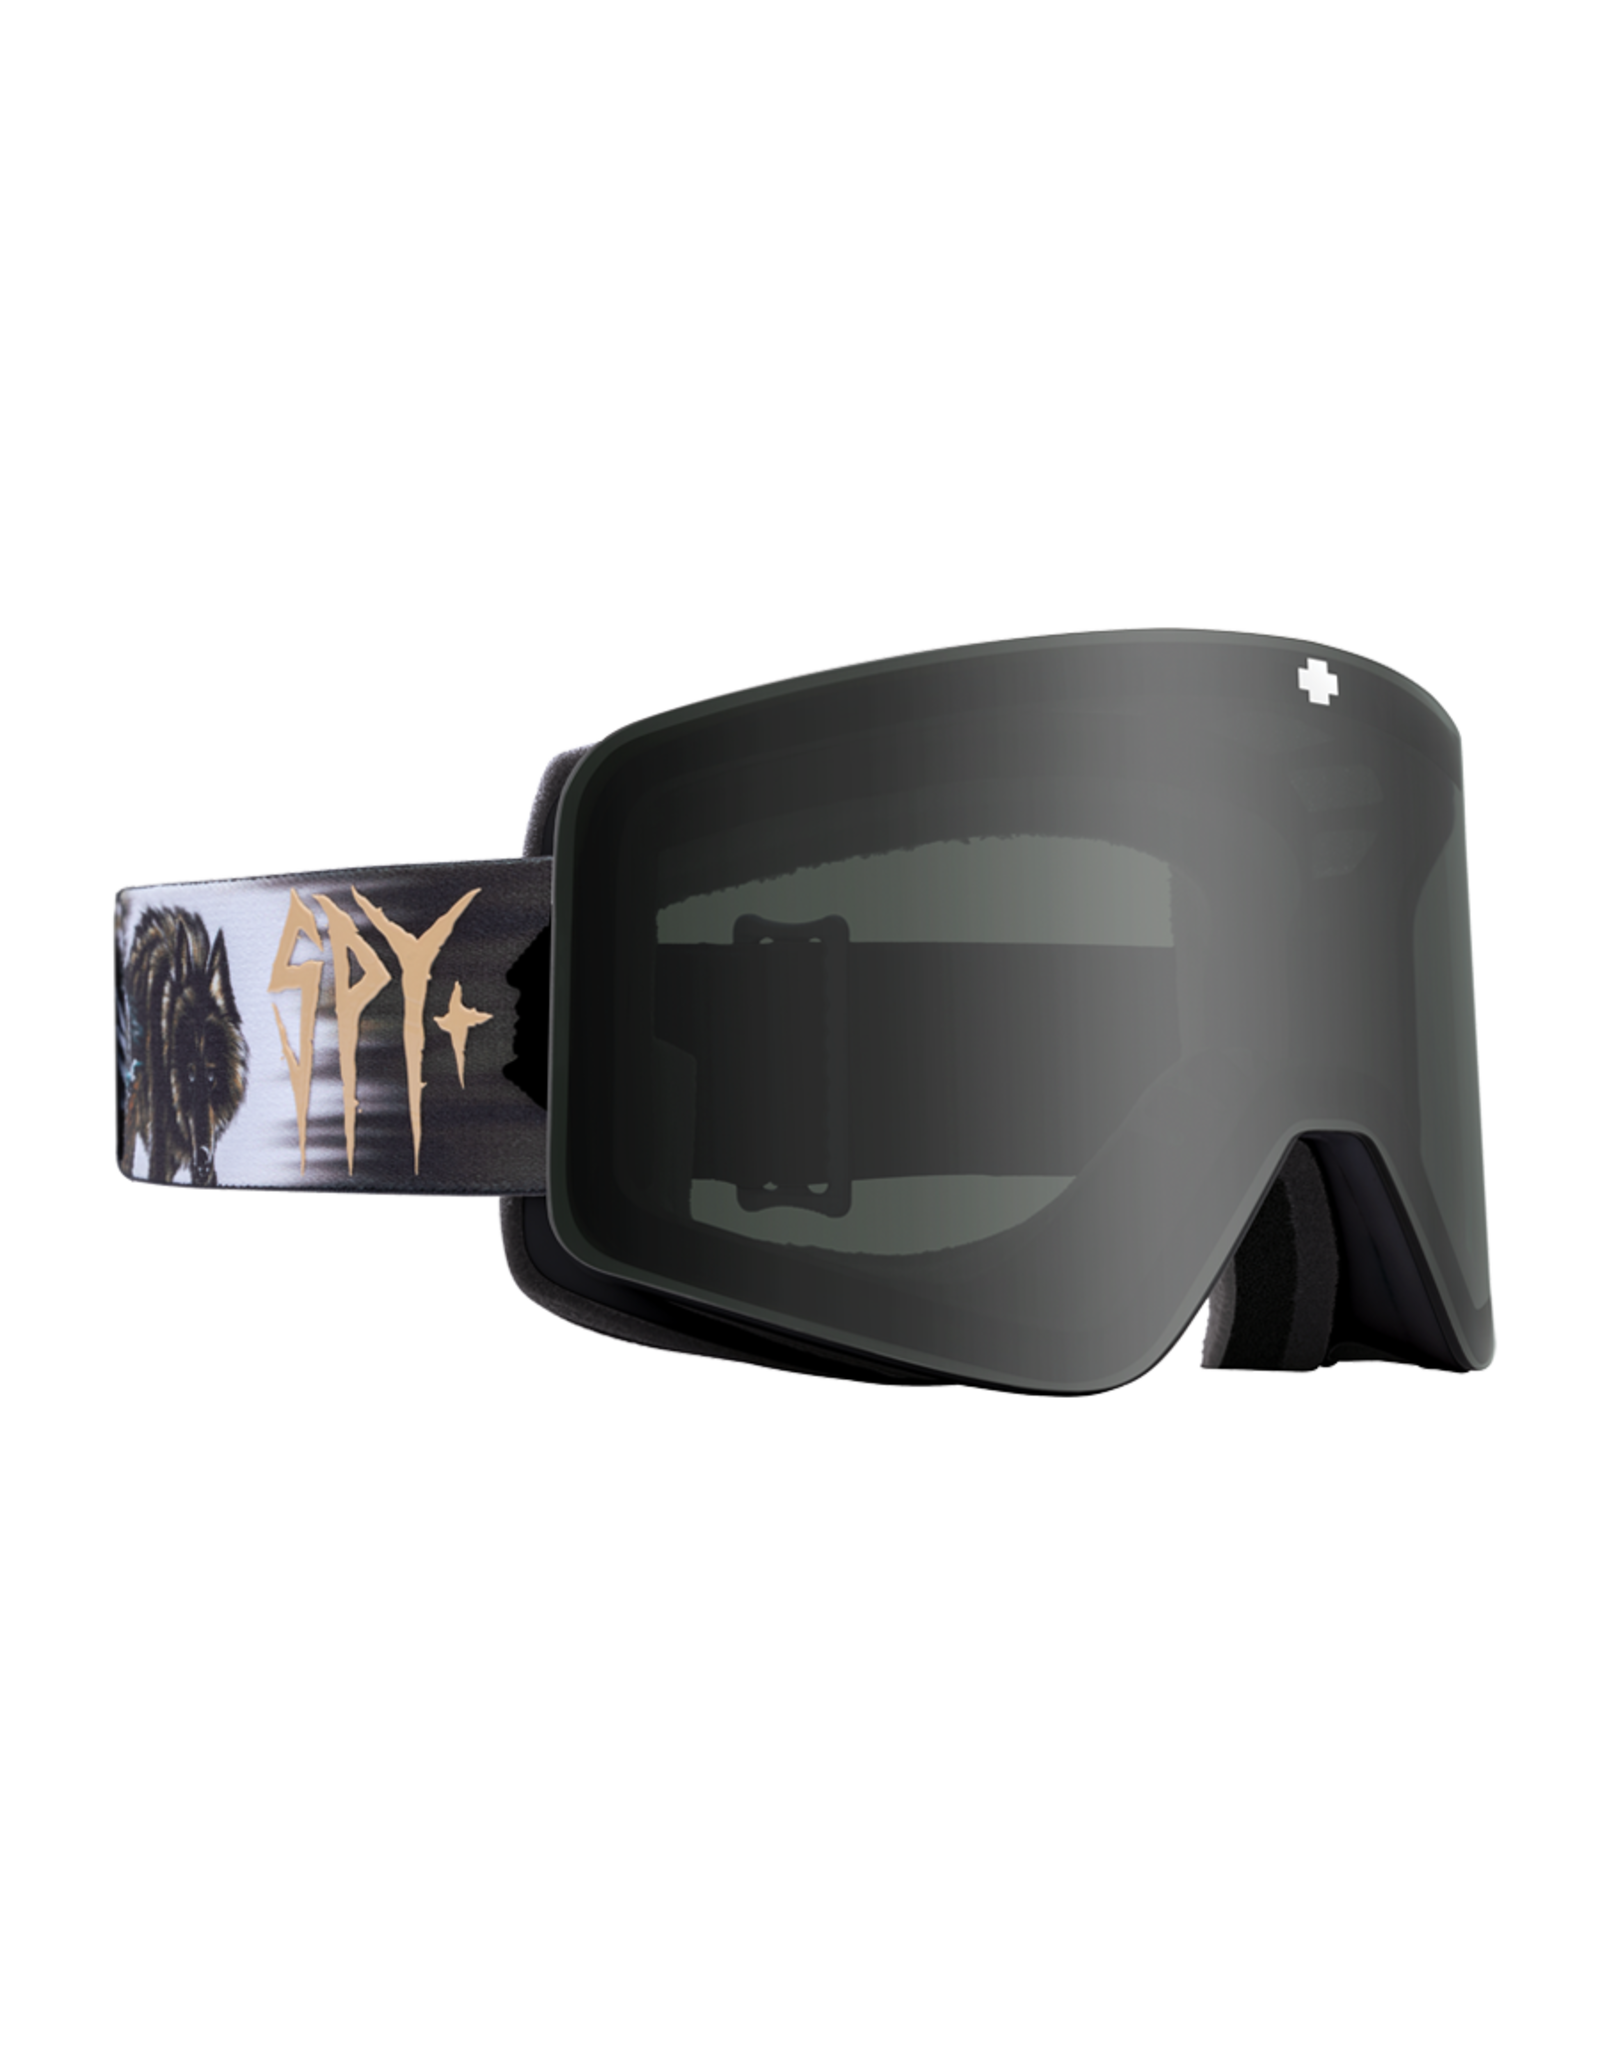 SPY Marauder Damasso Sanchez w/HD Plus Gray Green/Black Spectra Mirror and HD Plus LL Persimmon/Silver Spectra Mirror